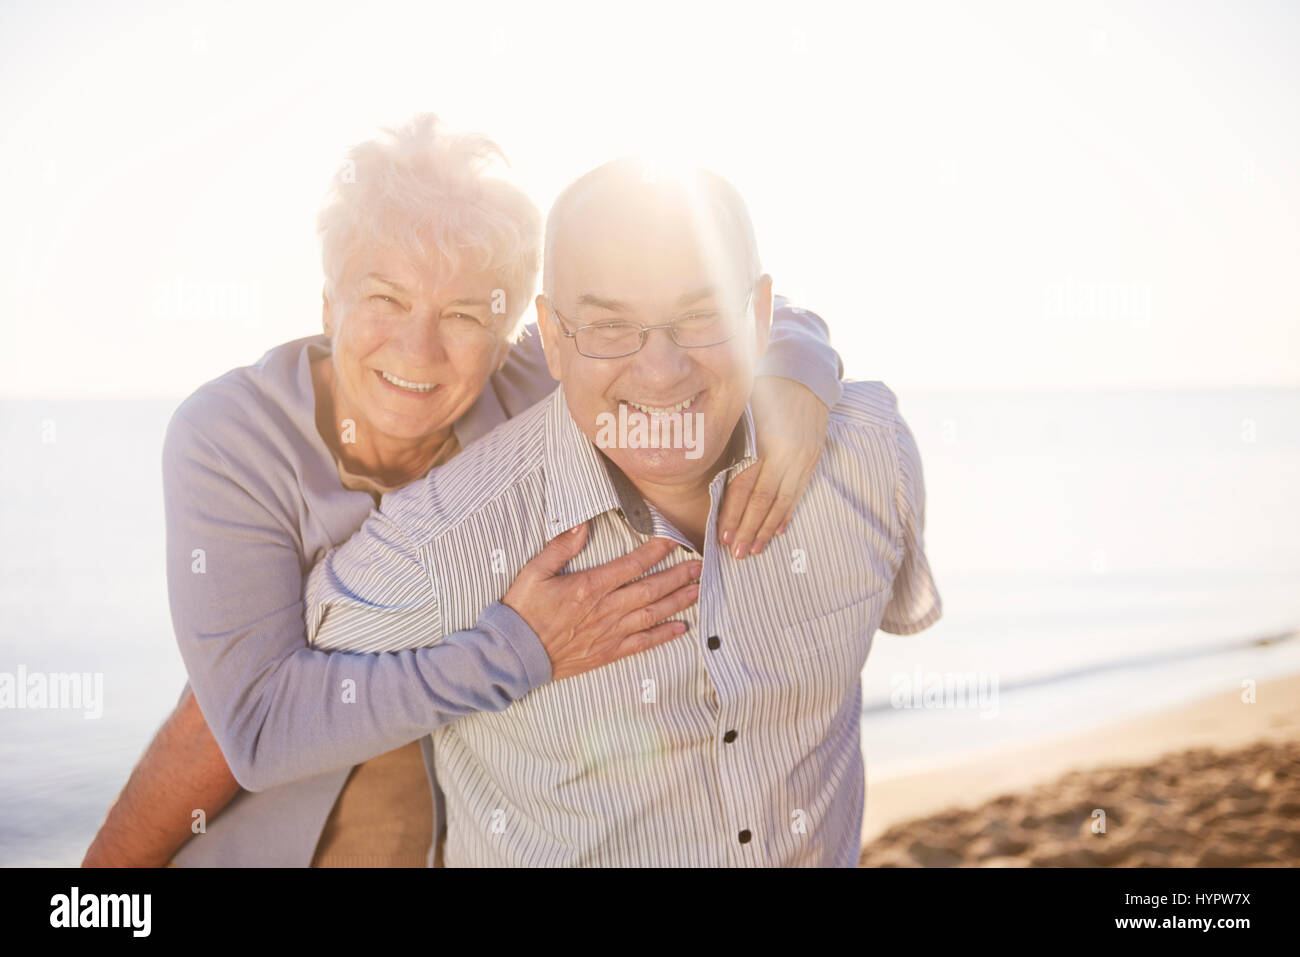 Seniors having fun on the beach - Stock Image